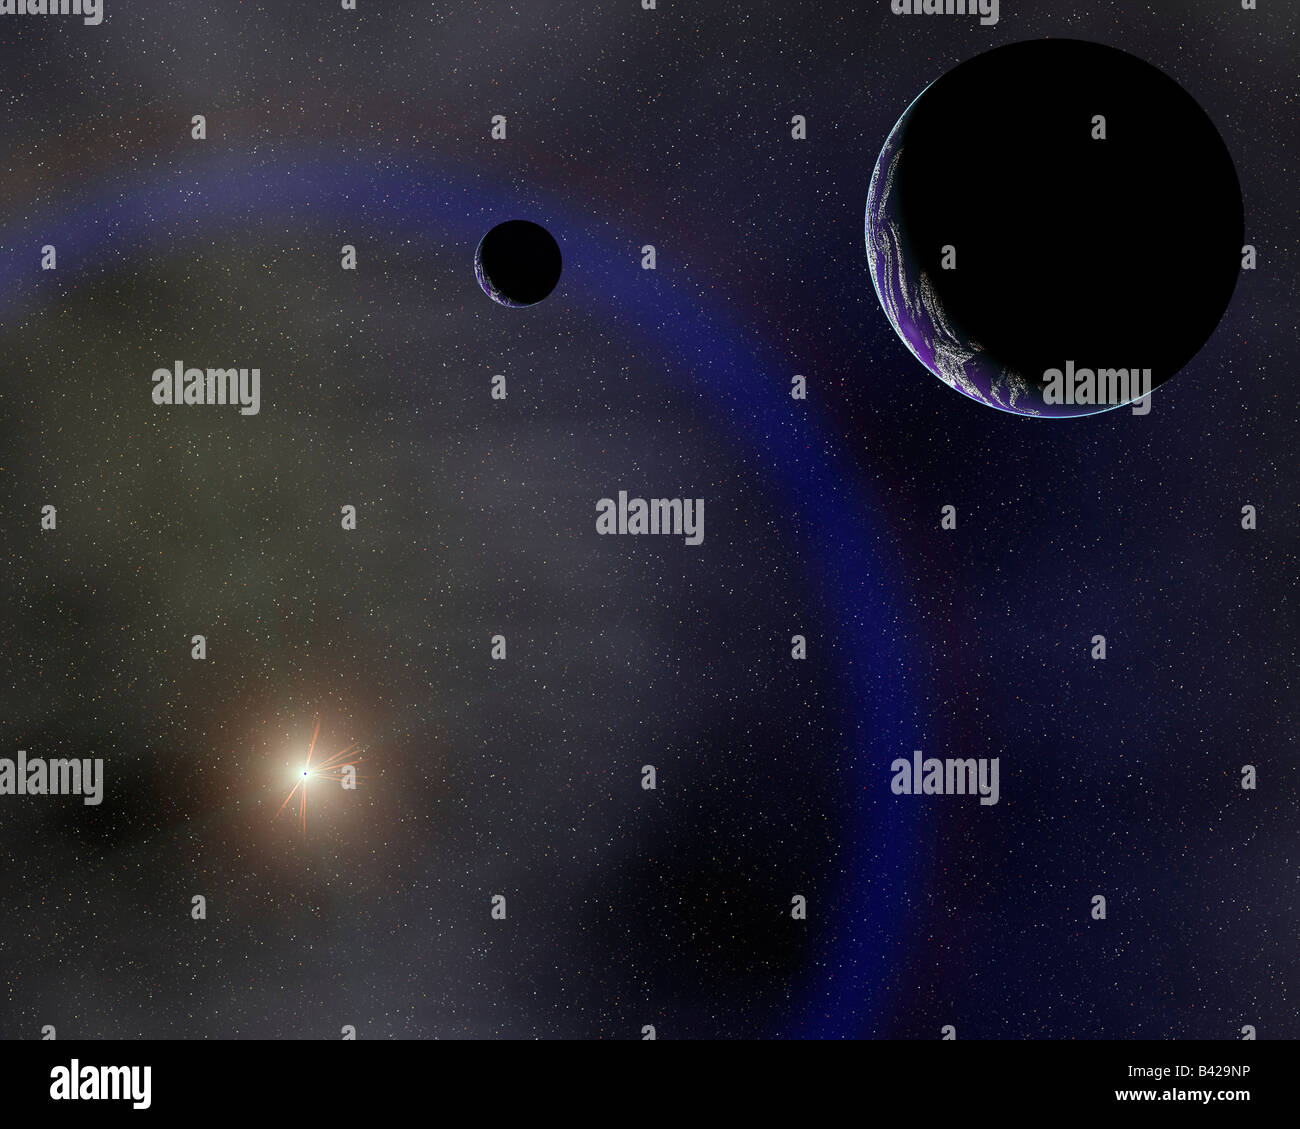 The Earth & Moon In Orbit Around The Sun. - Stock Image